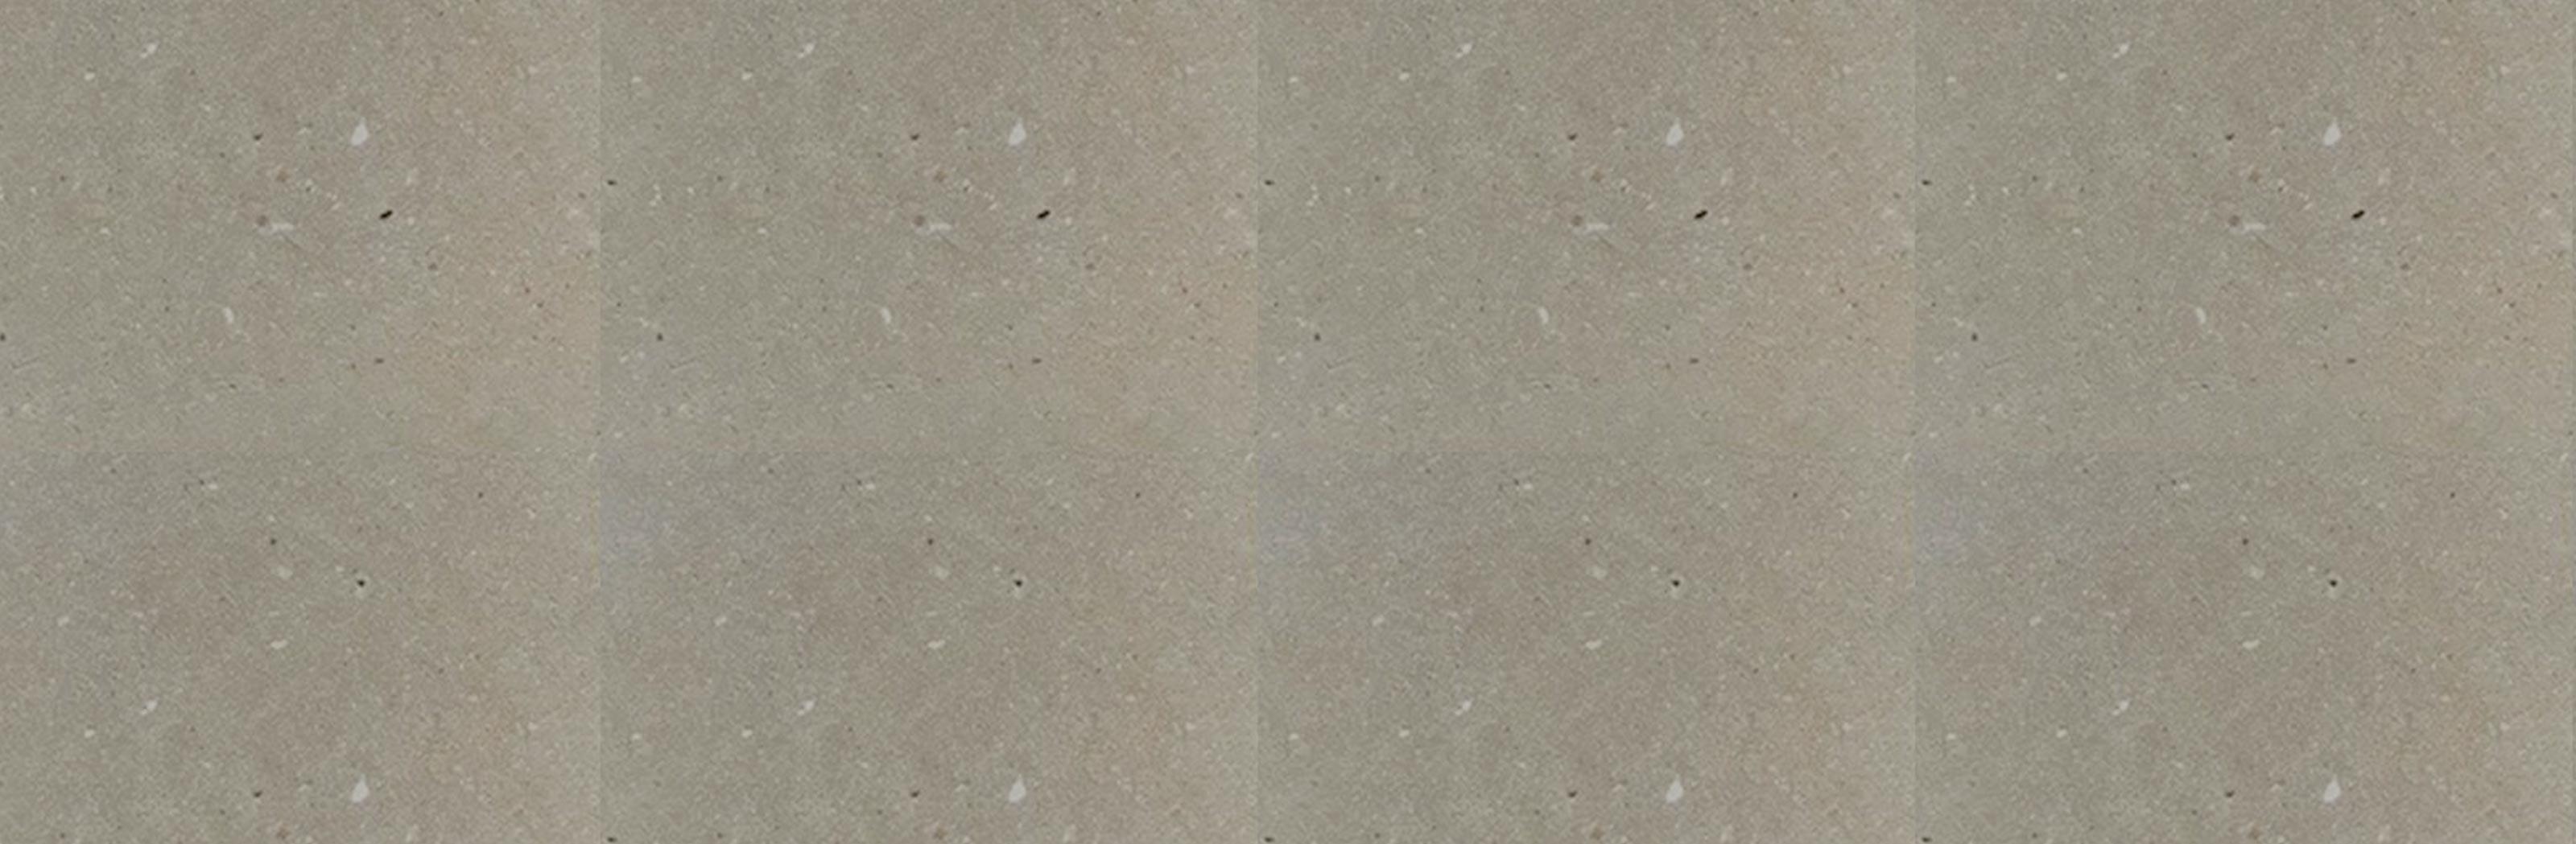 spanish limestone tiles